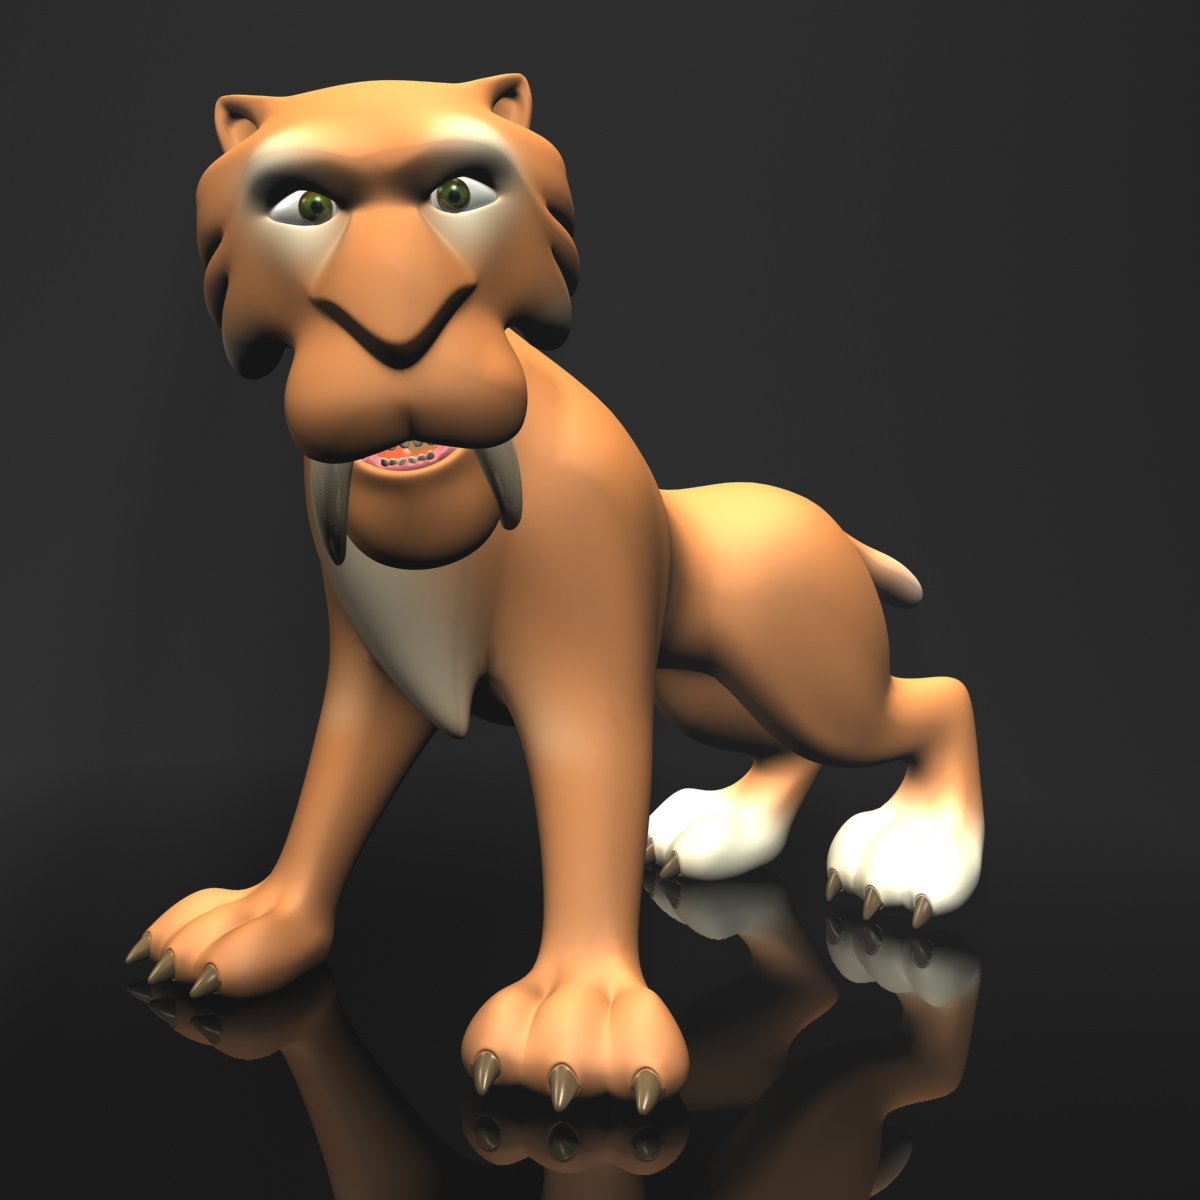 cartoon sabertooth tiger rigged 3d model 3ds max fbx  obj 214099